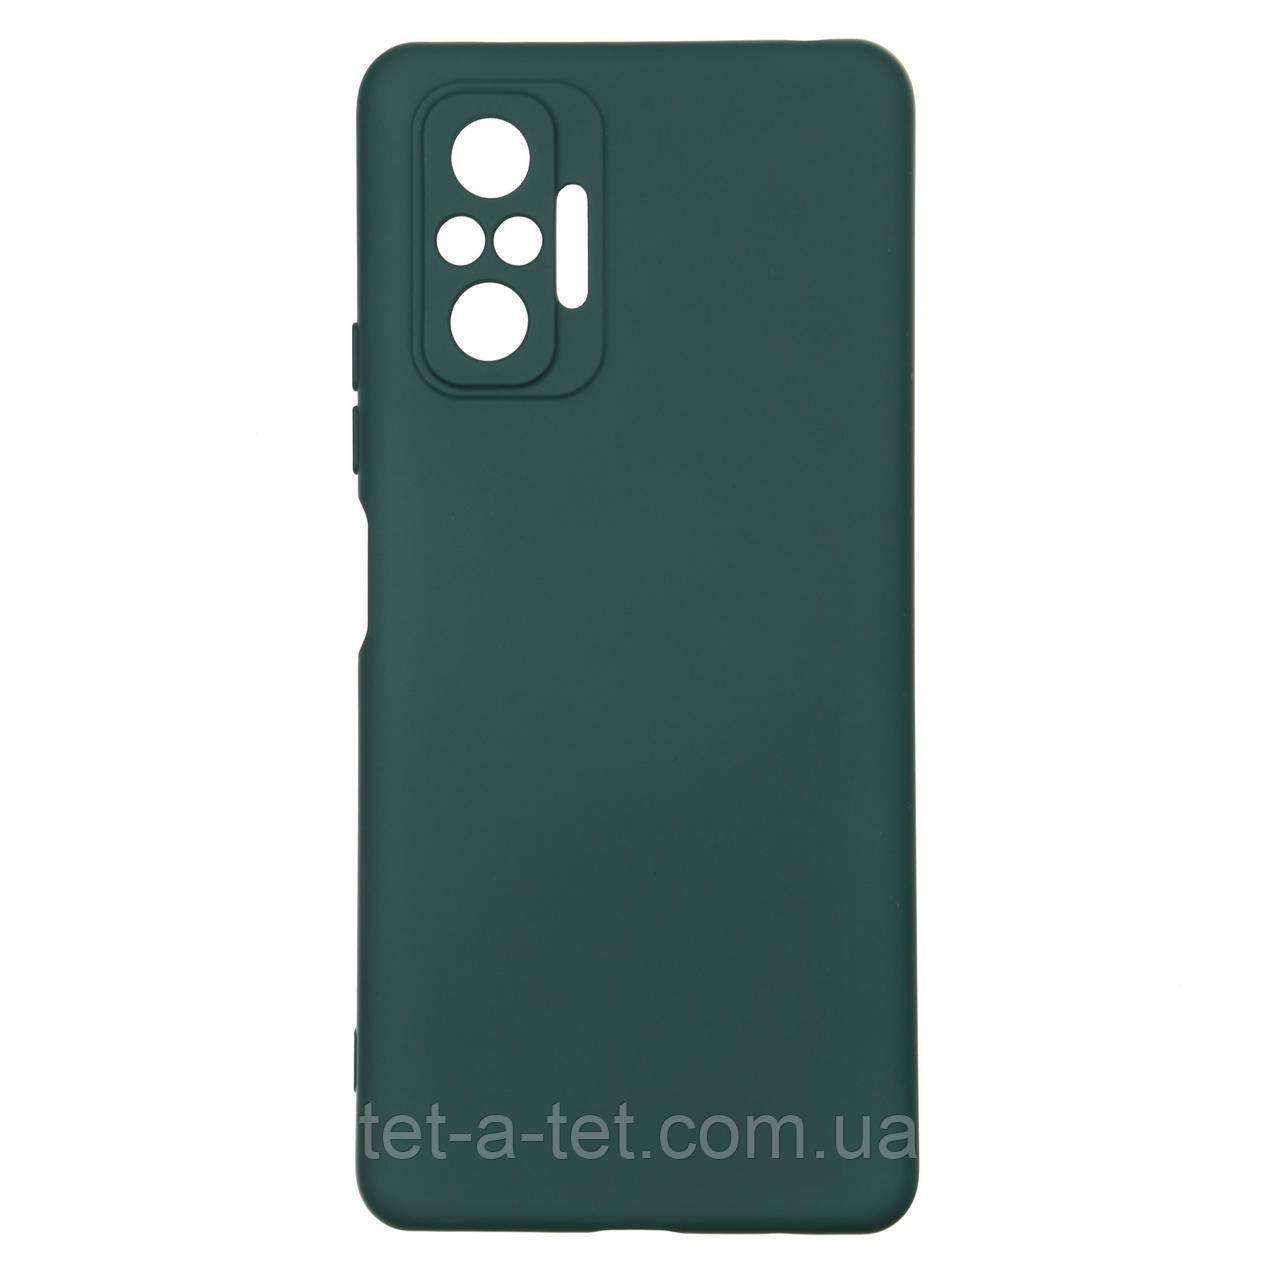 Чехол силиконовый ArmorStandart ICON Case for Xiaomi Redmi Note 10 Pro Pine Green